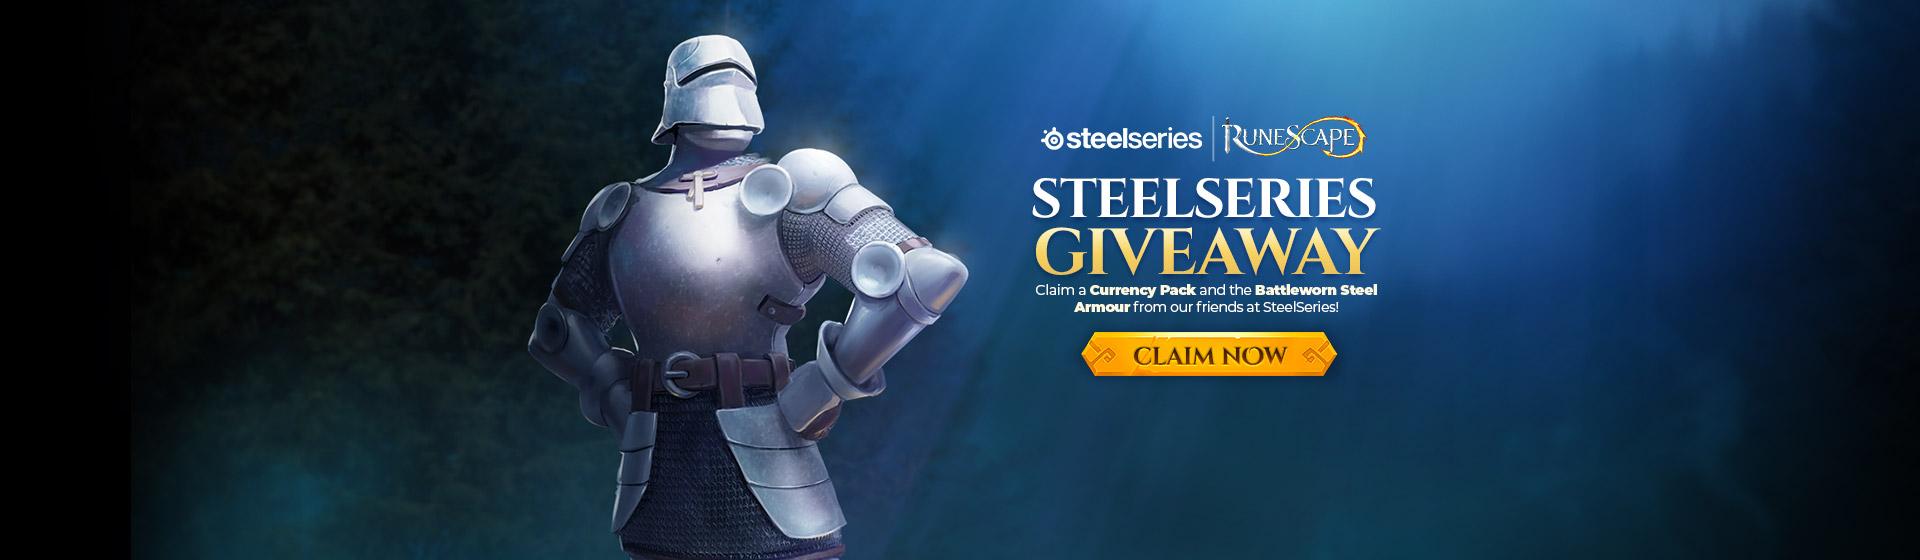 SteelSeries Partnership